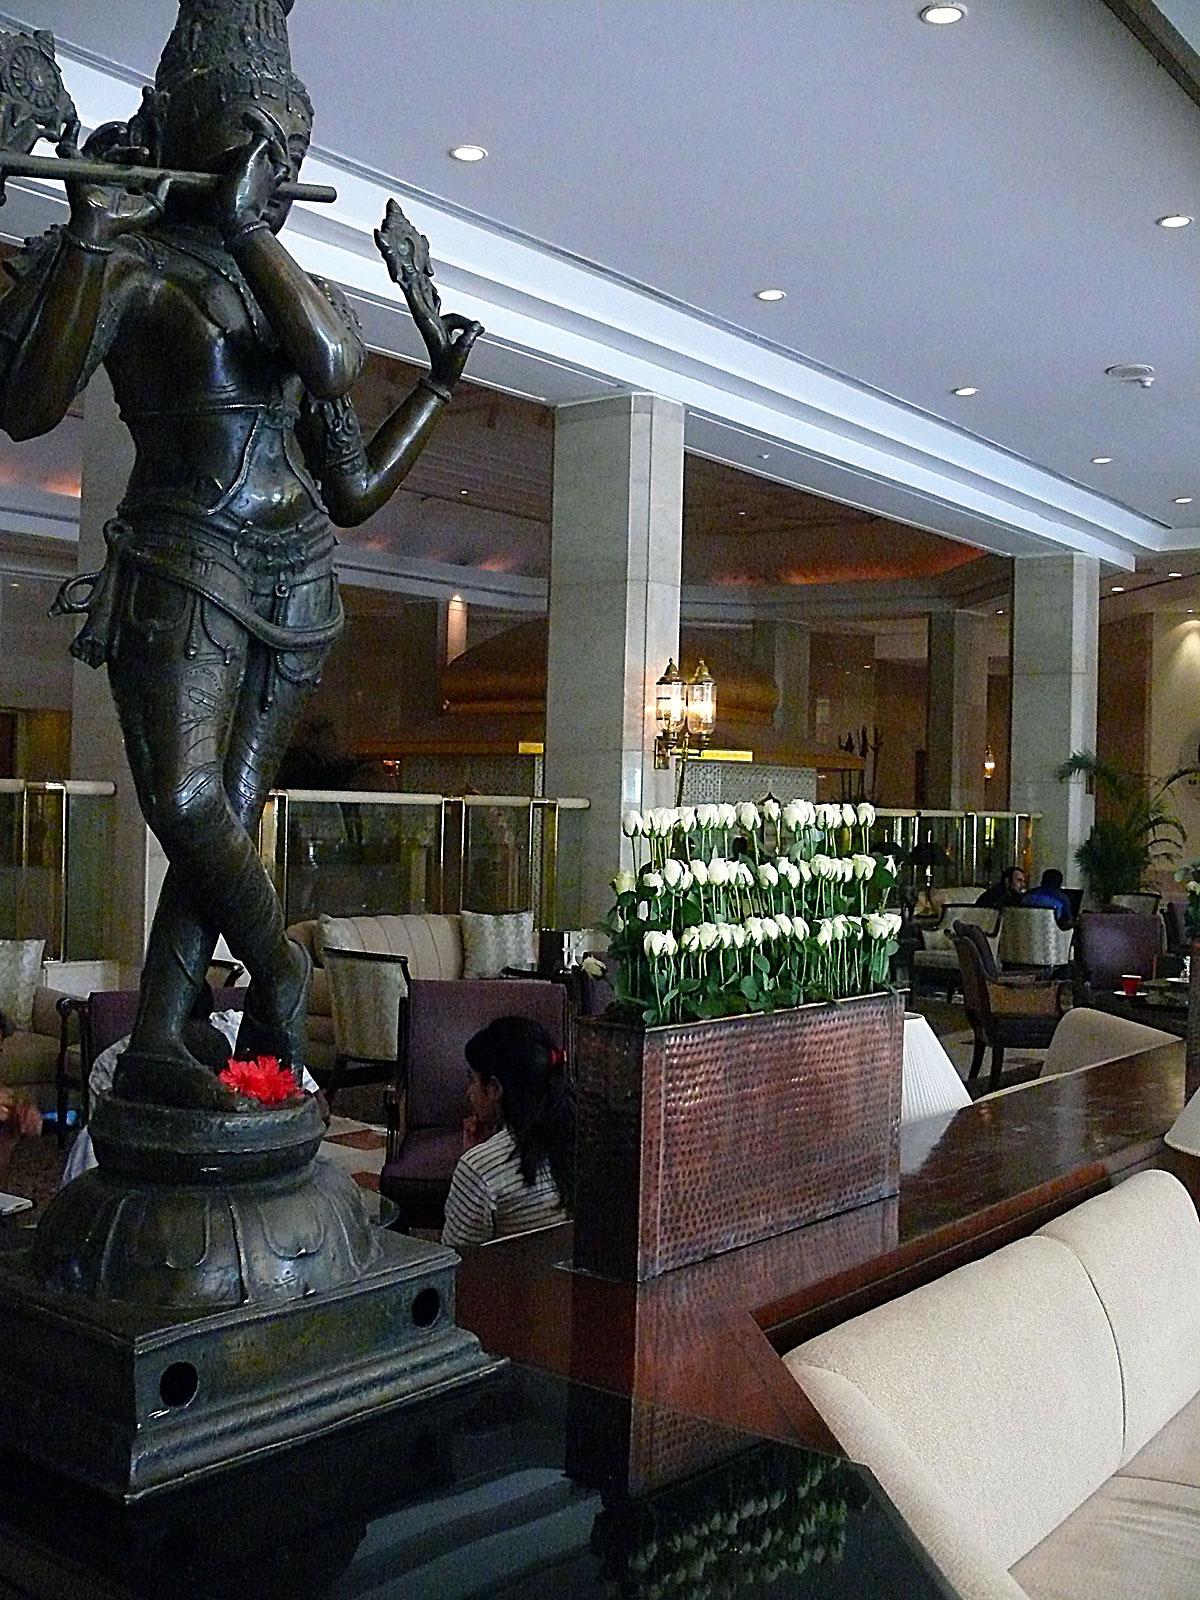 INDIEN MUMBAI Hotel The Leela FINEST-onTour P1030307.jpg